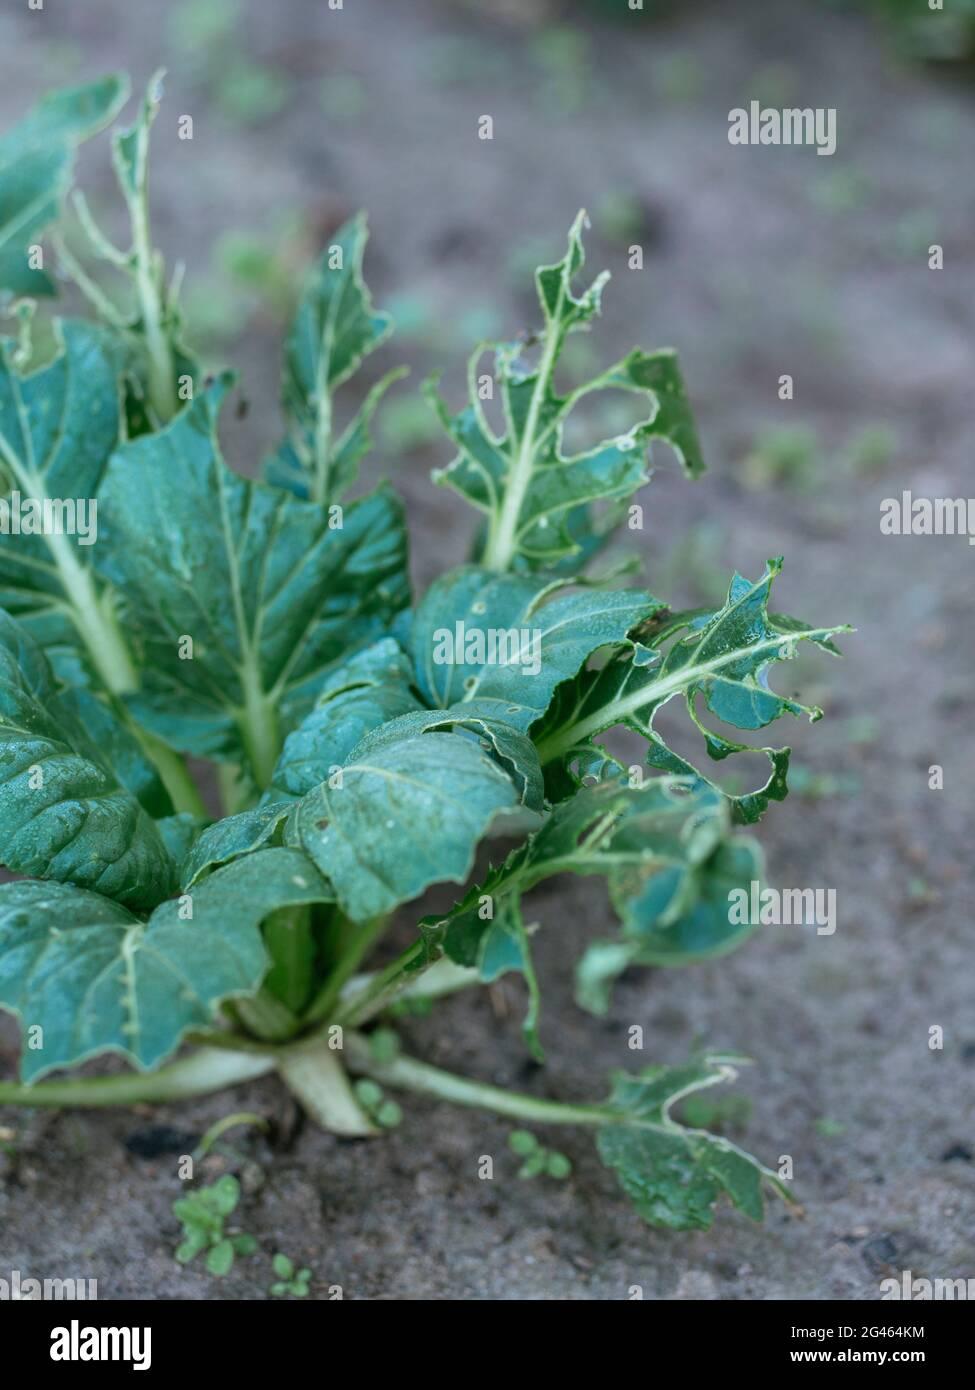 Tatsoi (Brassica narinosa) eaten by slugs Stock Photo